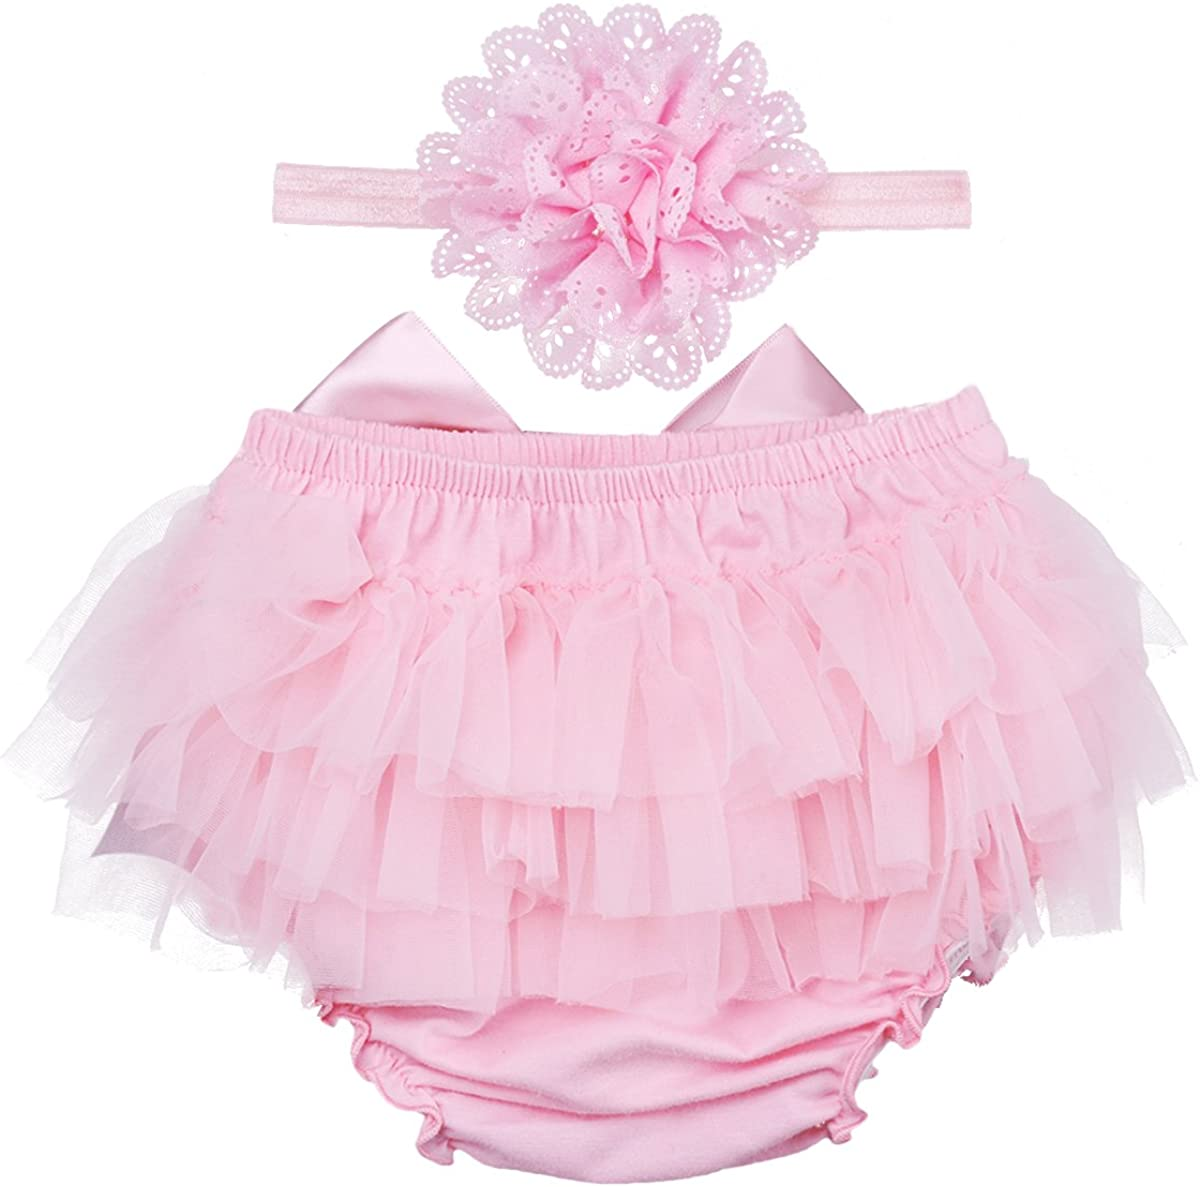 IWEMEK 3PCs Newborn Baby Girls 1st Birthday Cake Smash Romper Jumpsuit Bodysuit Tutu Skirt Dress Party Headband Outfits